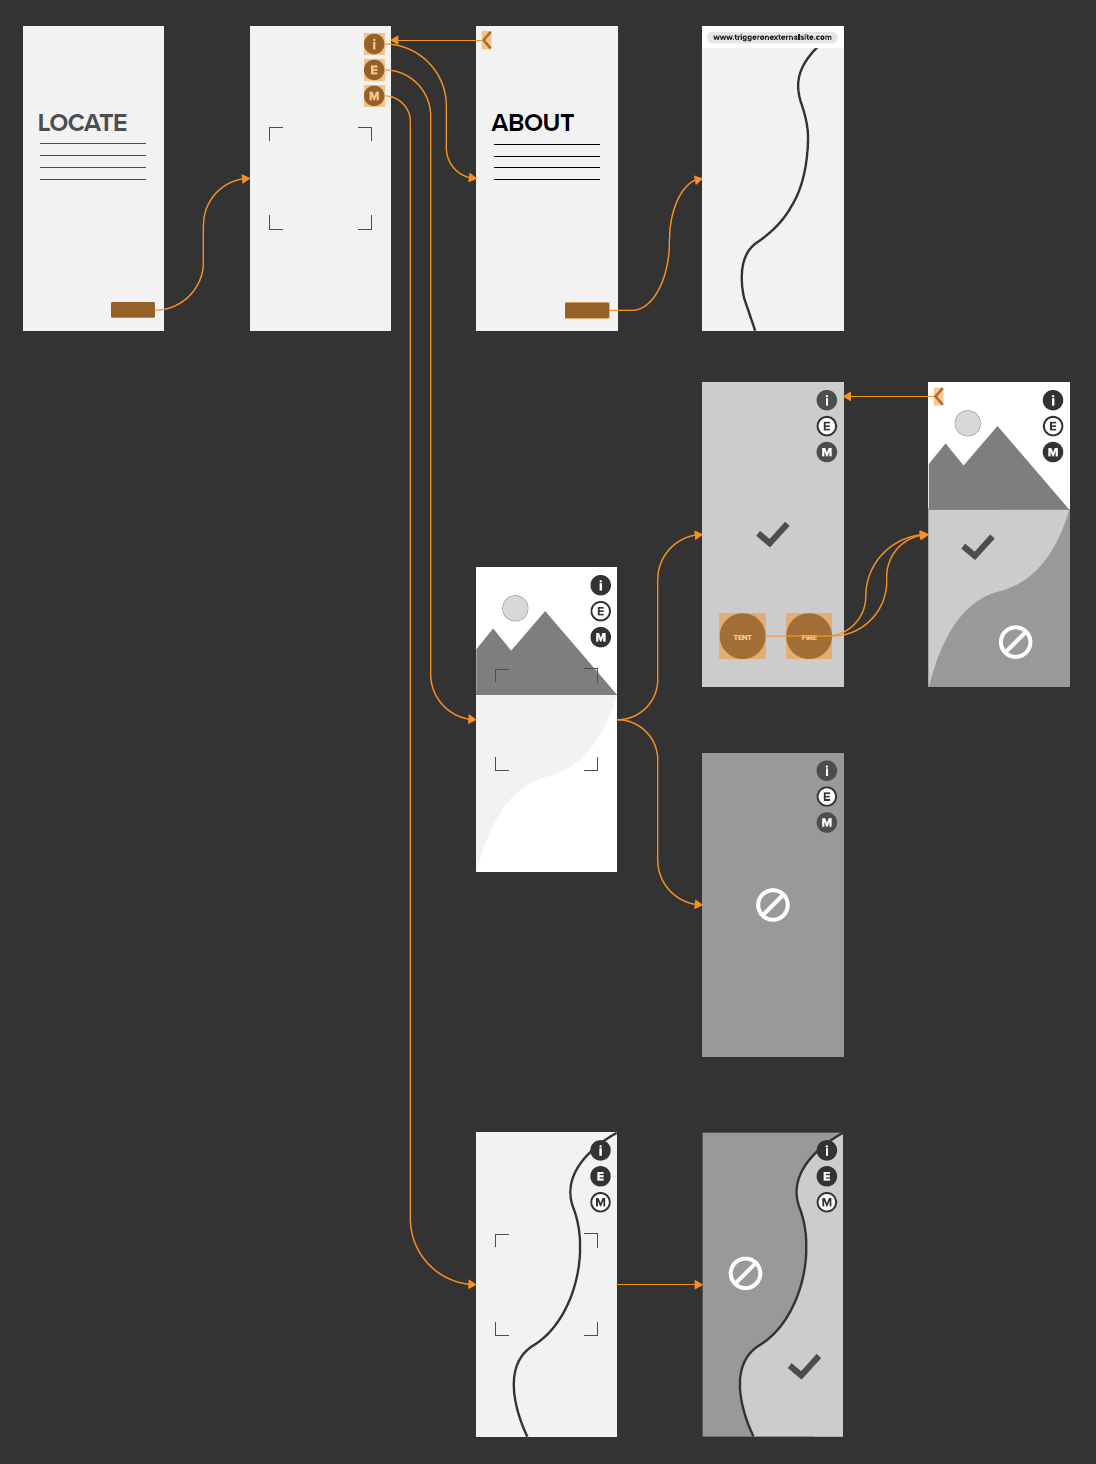 UX wireframes developed in AdobeXD